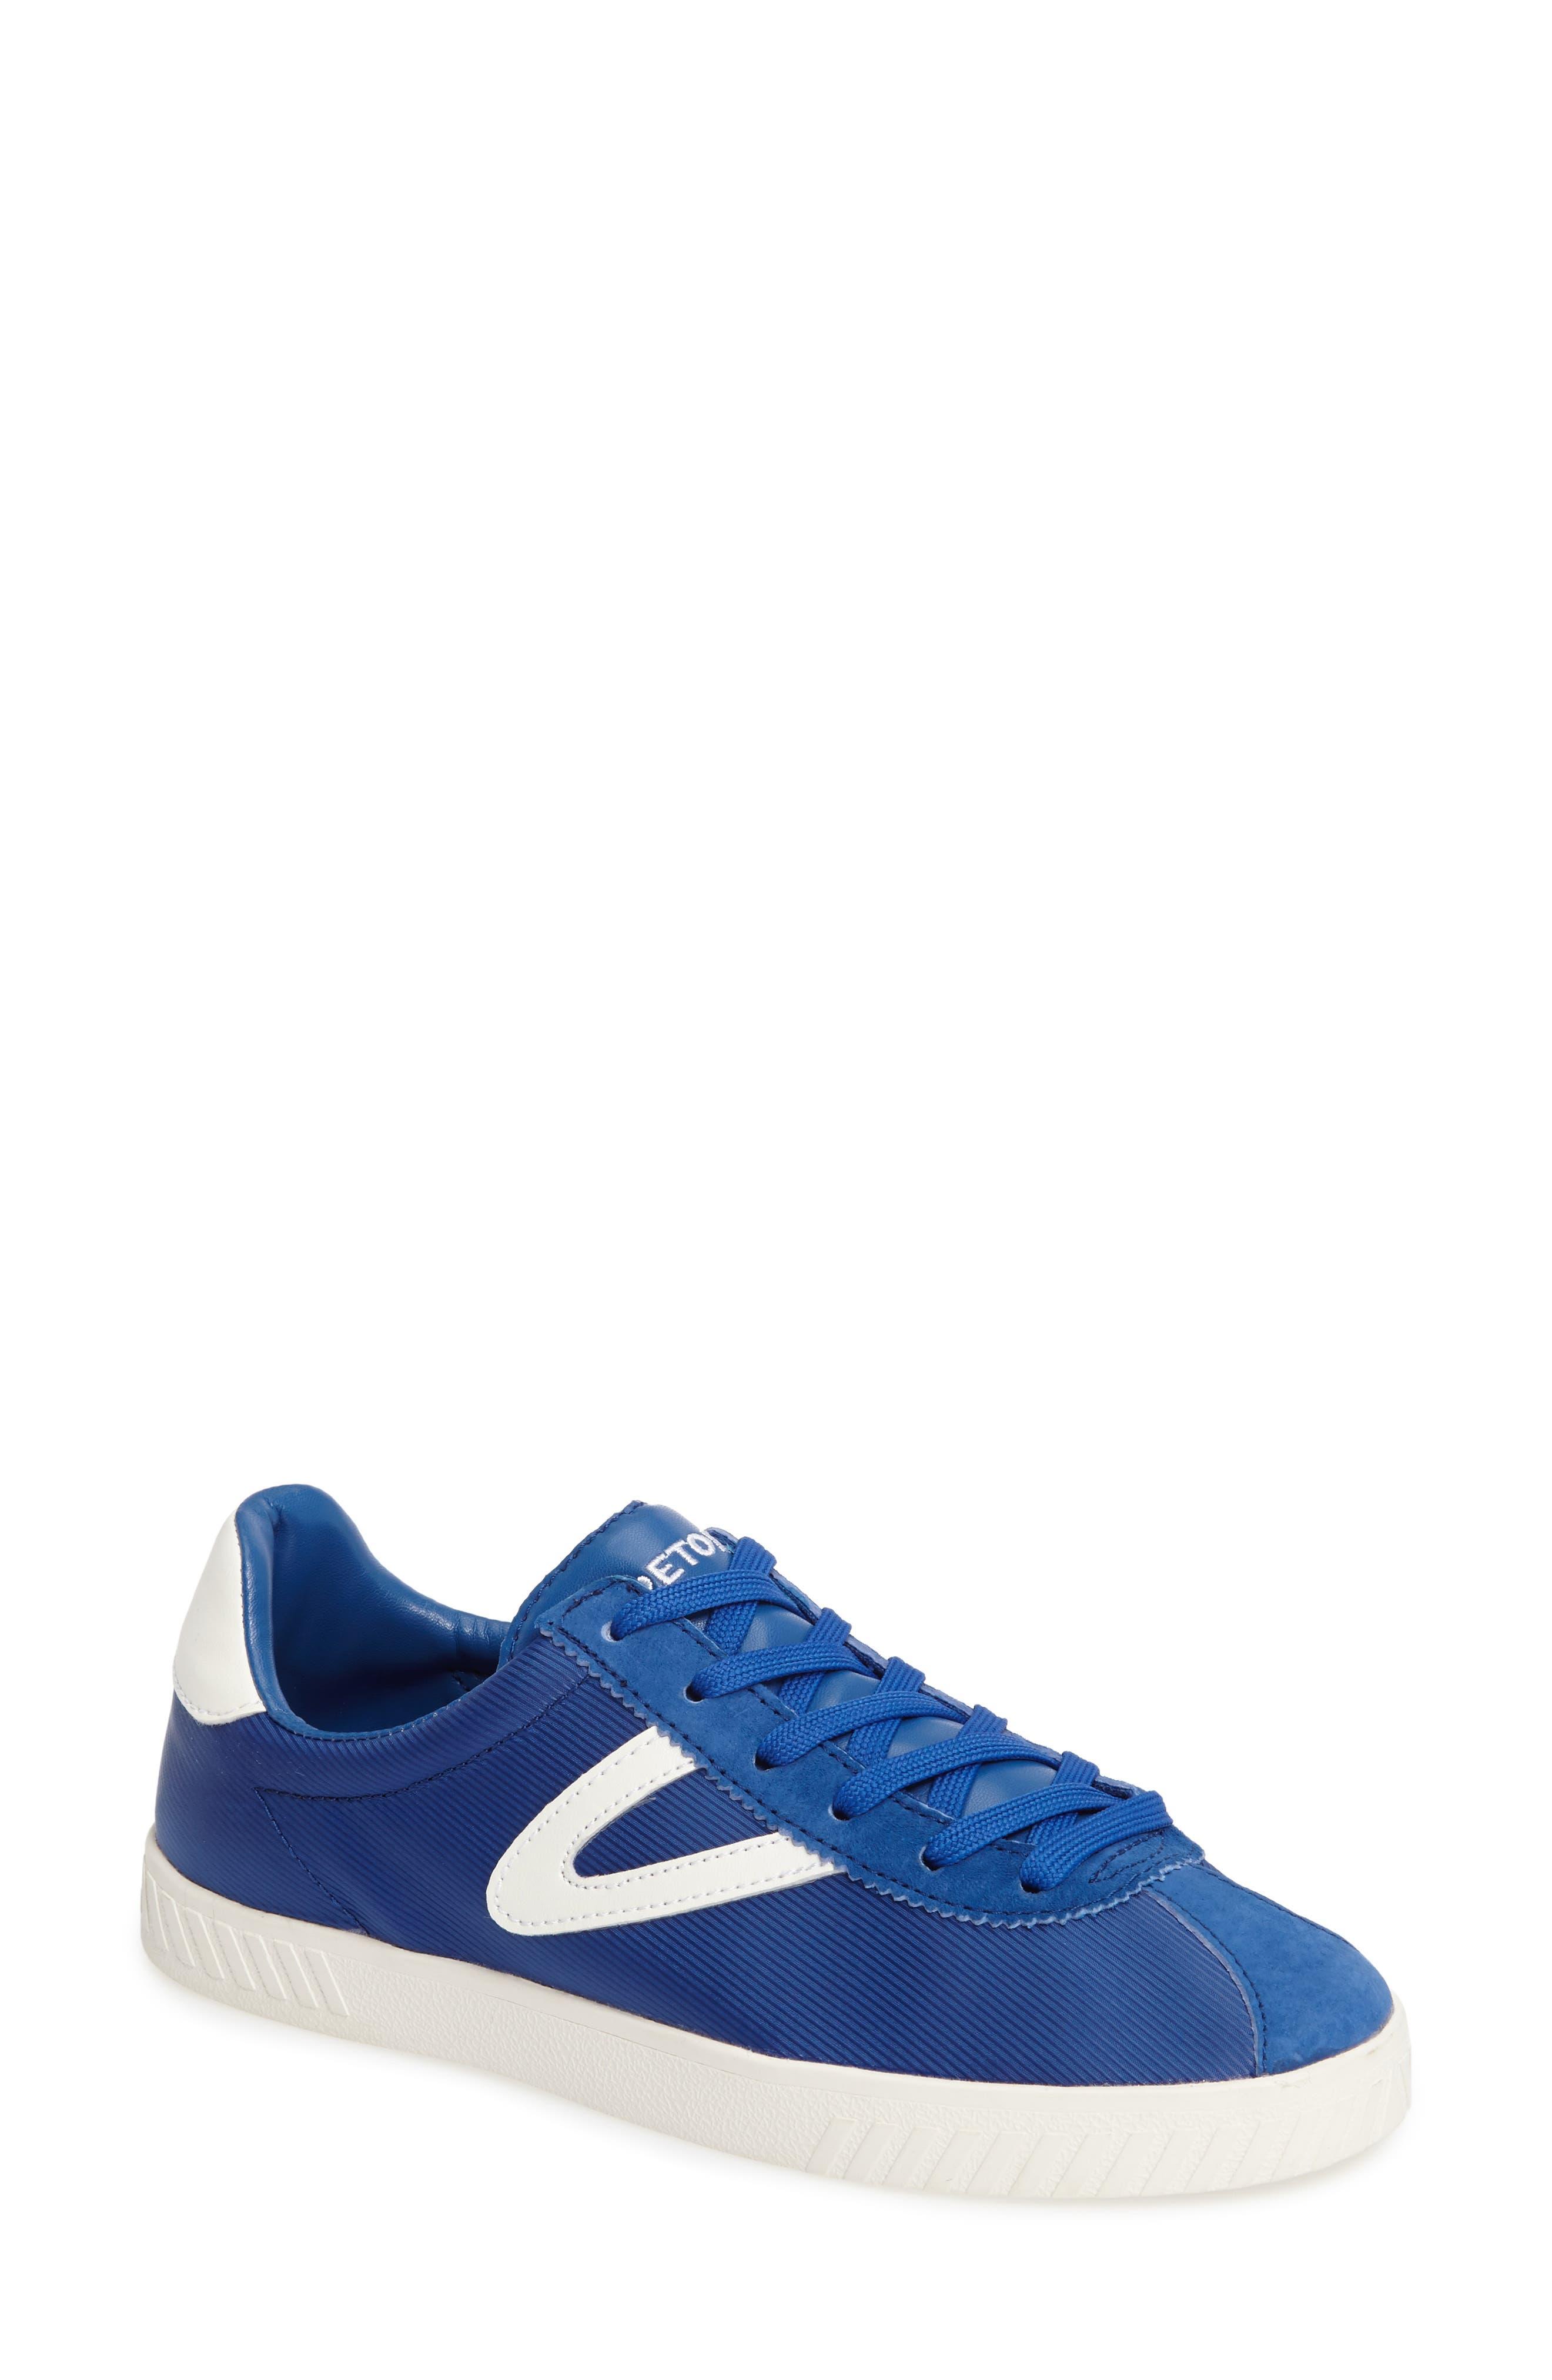 Tretorn Camden4 Sneaker (Women)